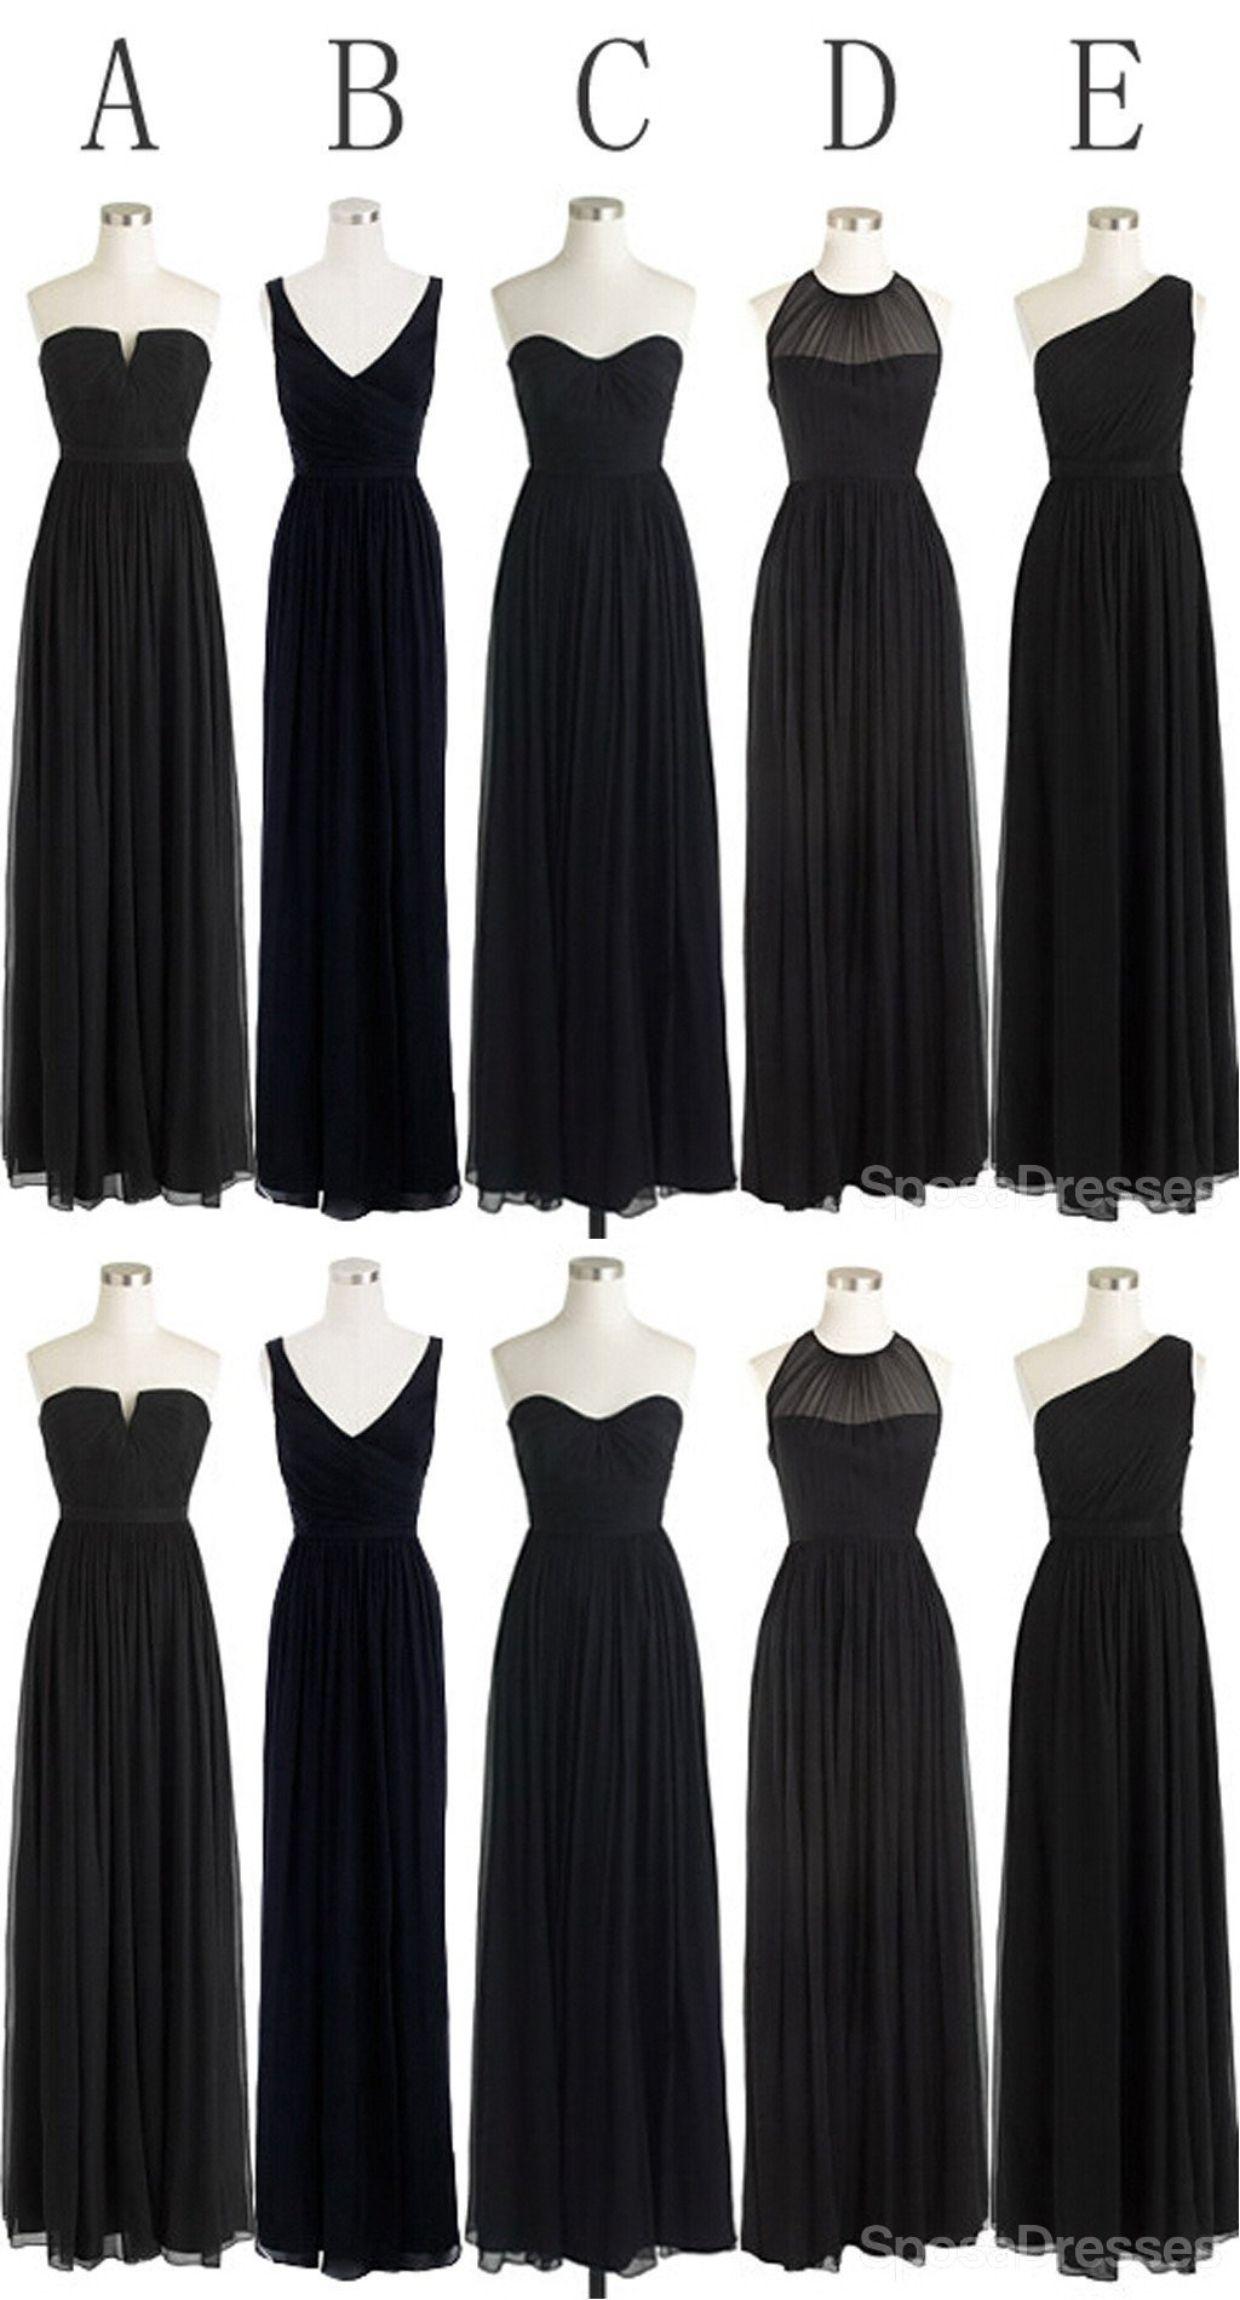 Black Cheap Simple Mismatched Styles Chiffon Floor Length Formal Long Bridesmaid Dresses Wg187 Black Bridesmaid Dress Mismatched Black Chiffon Bridesmaid Dresses Mismatched Bridesmaid Dresses